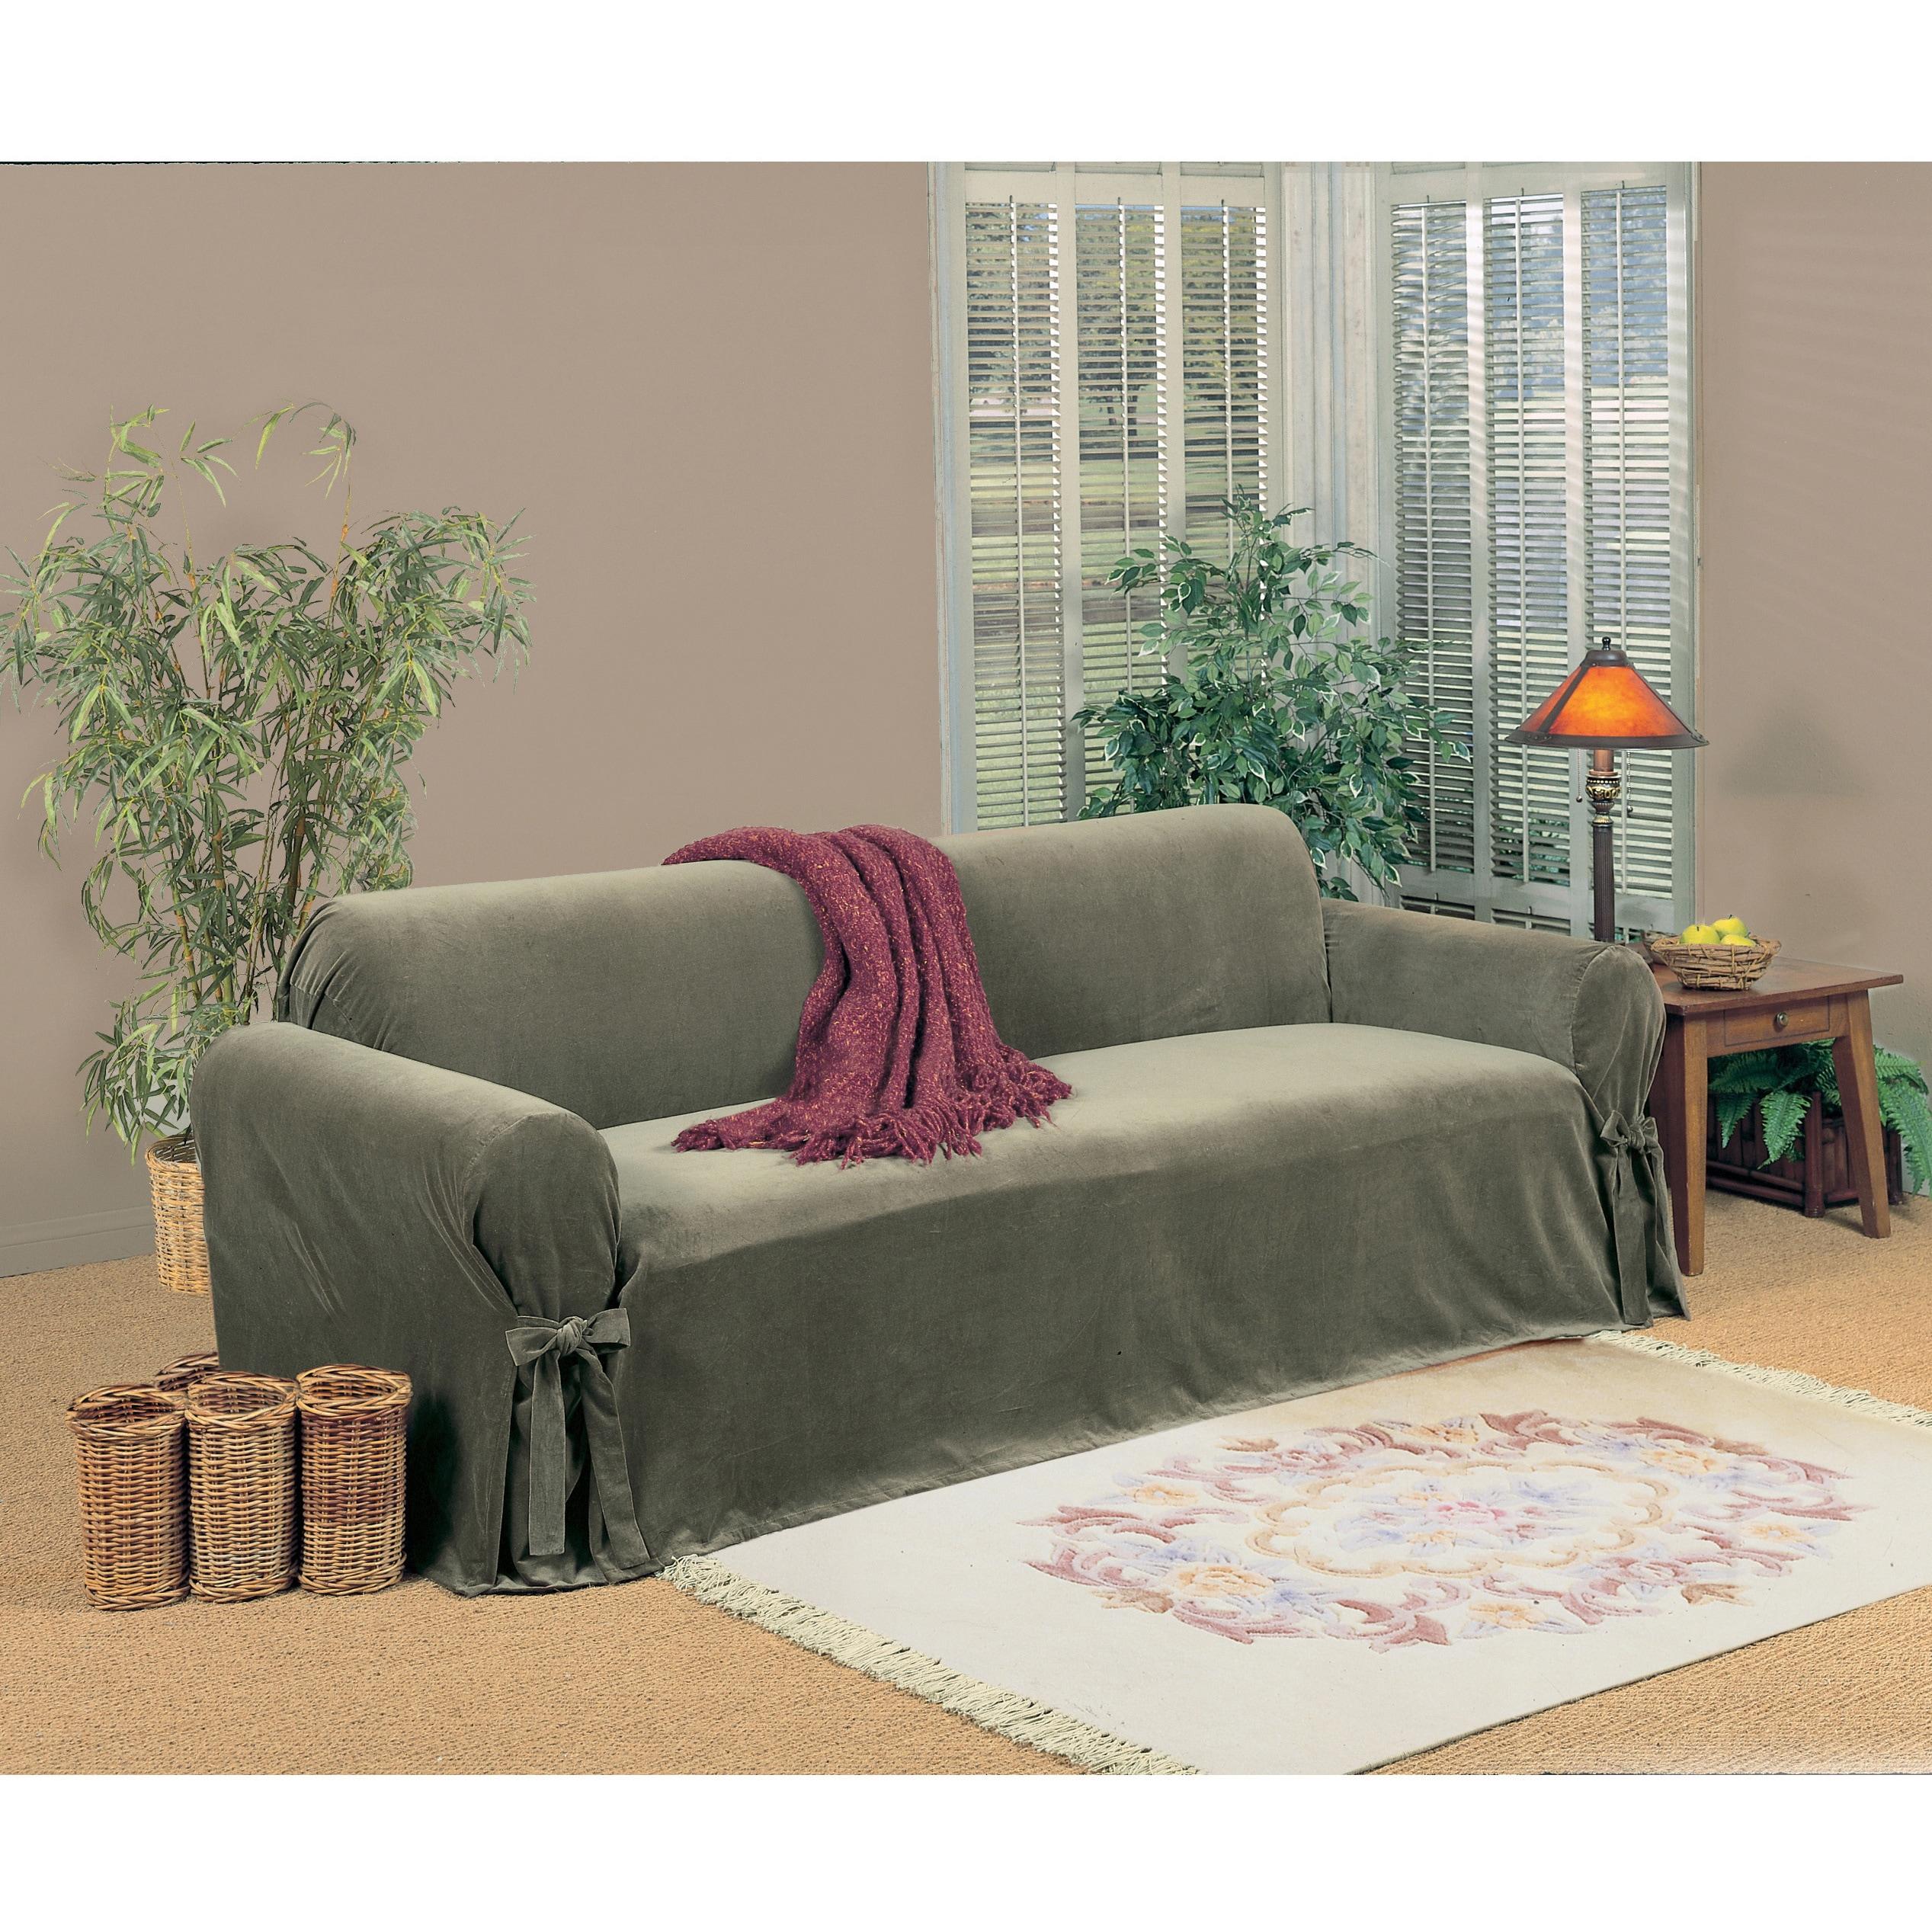 Clic Slipcovers Microfiber Velvet Sofa Slipcover Free Shipping Today 8101775